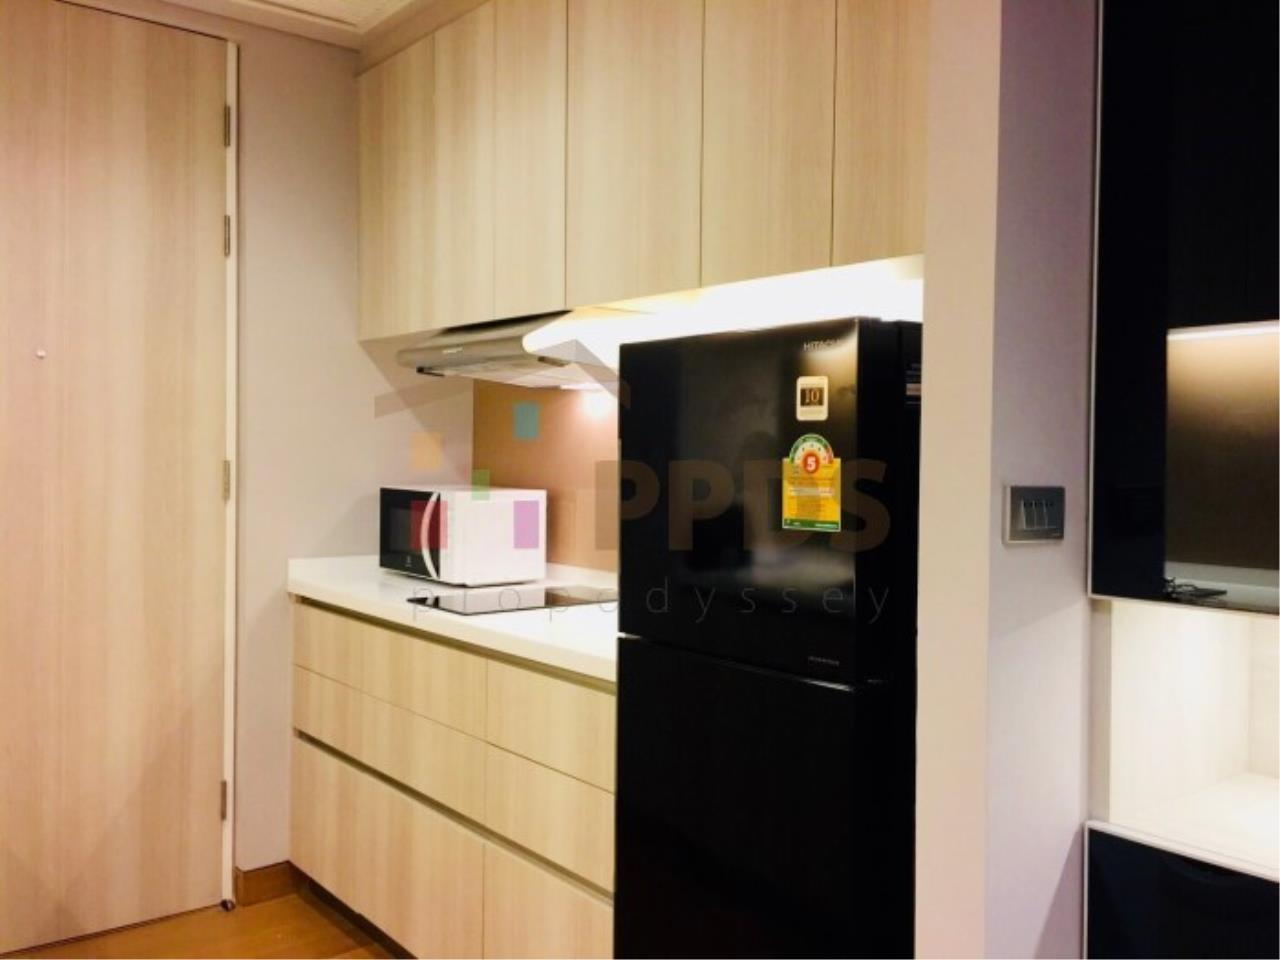 Propodyssey Agency's 2 bedrooms condo for rent Sukhumvit soi 24 called Lumpini 24 close to K-Village 11